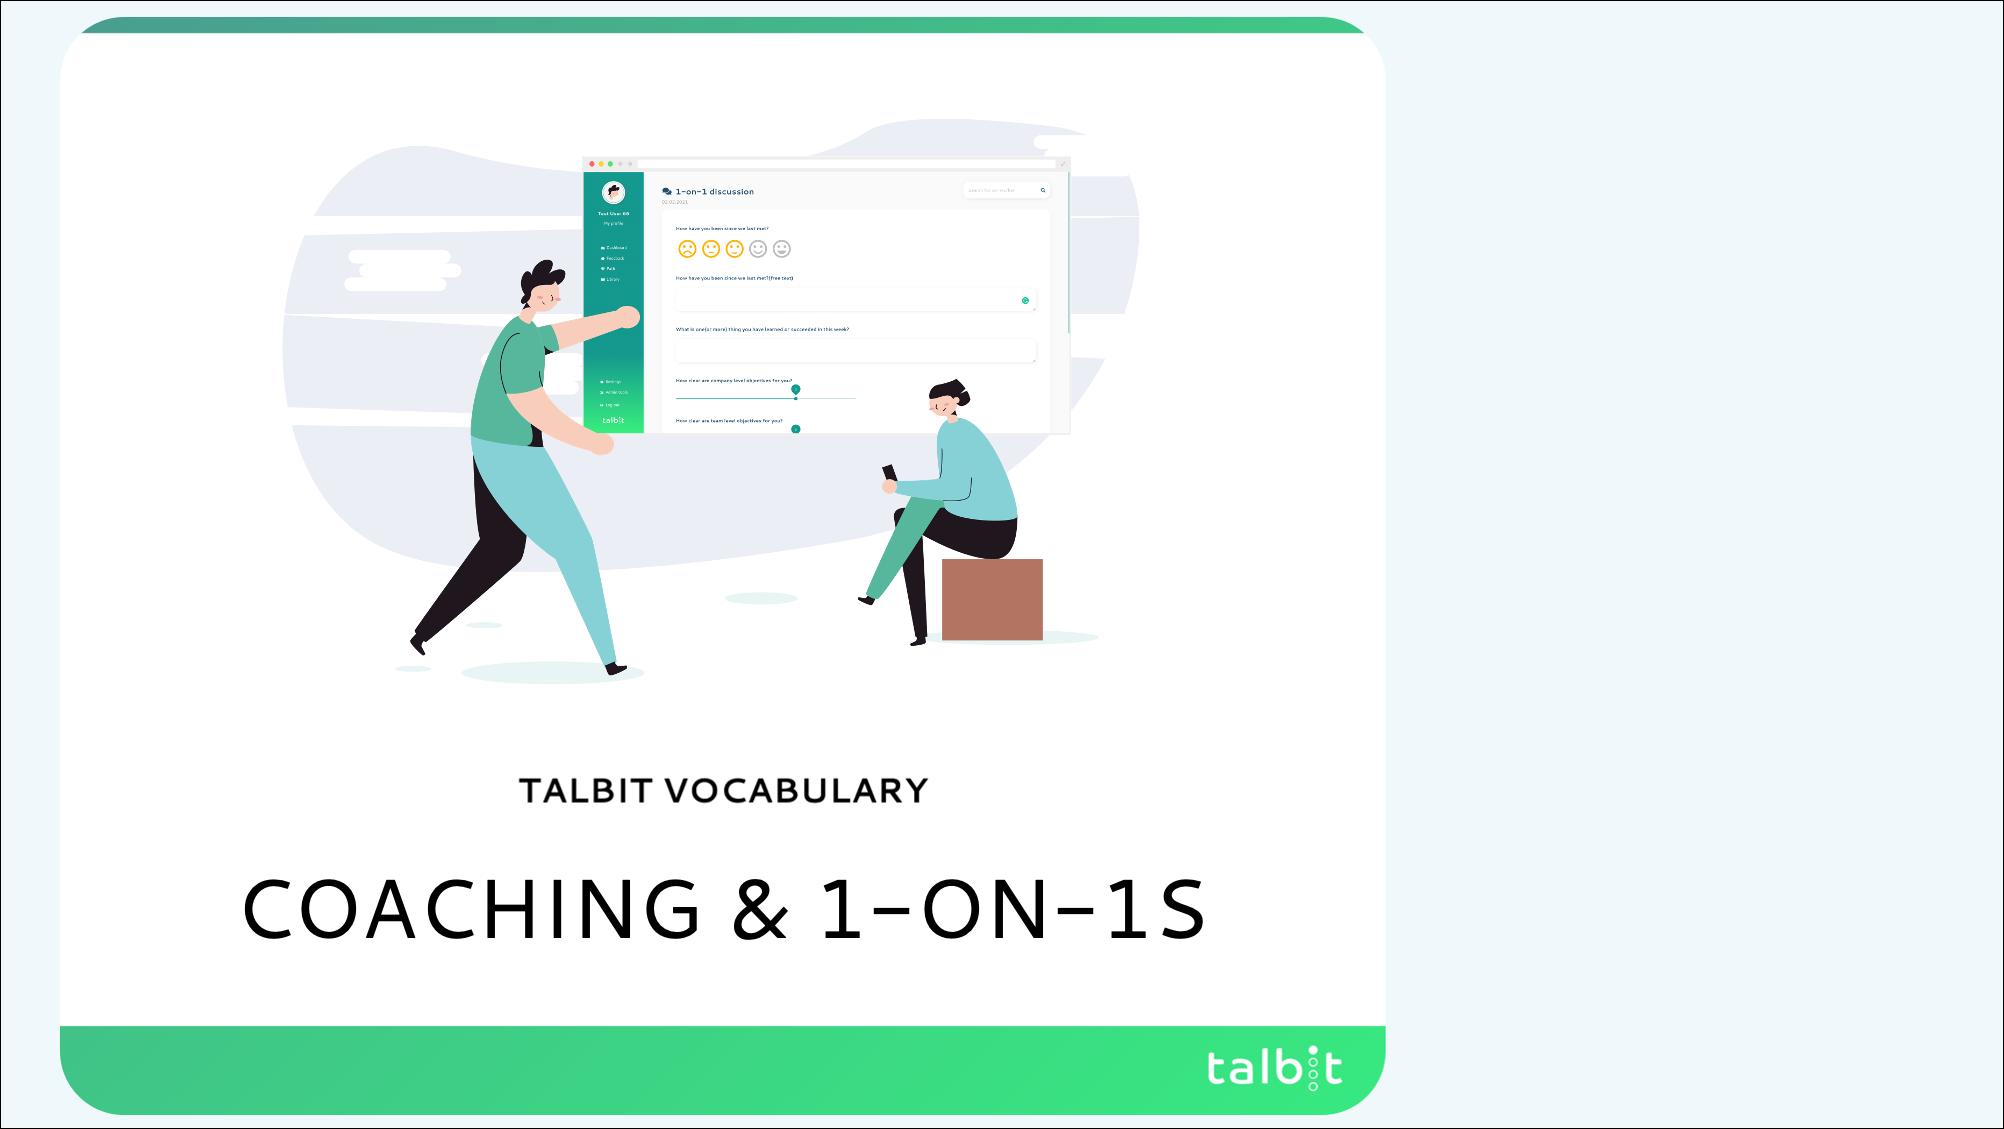 Vocabulary: Coaching & 1-on-1s